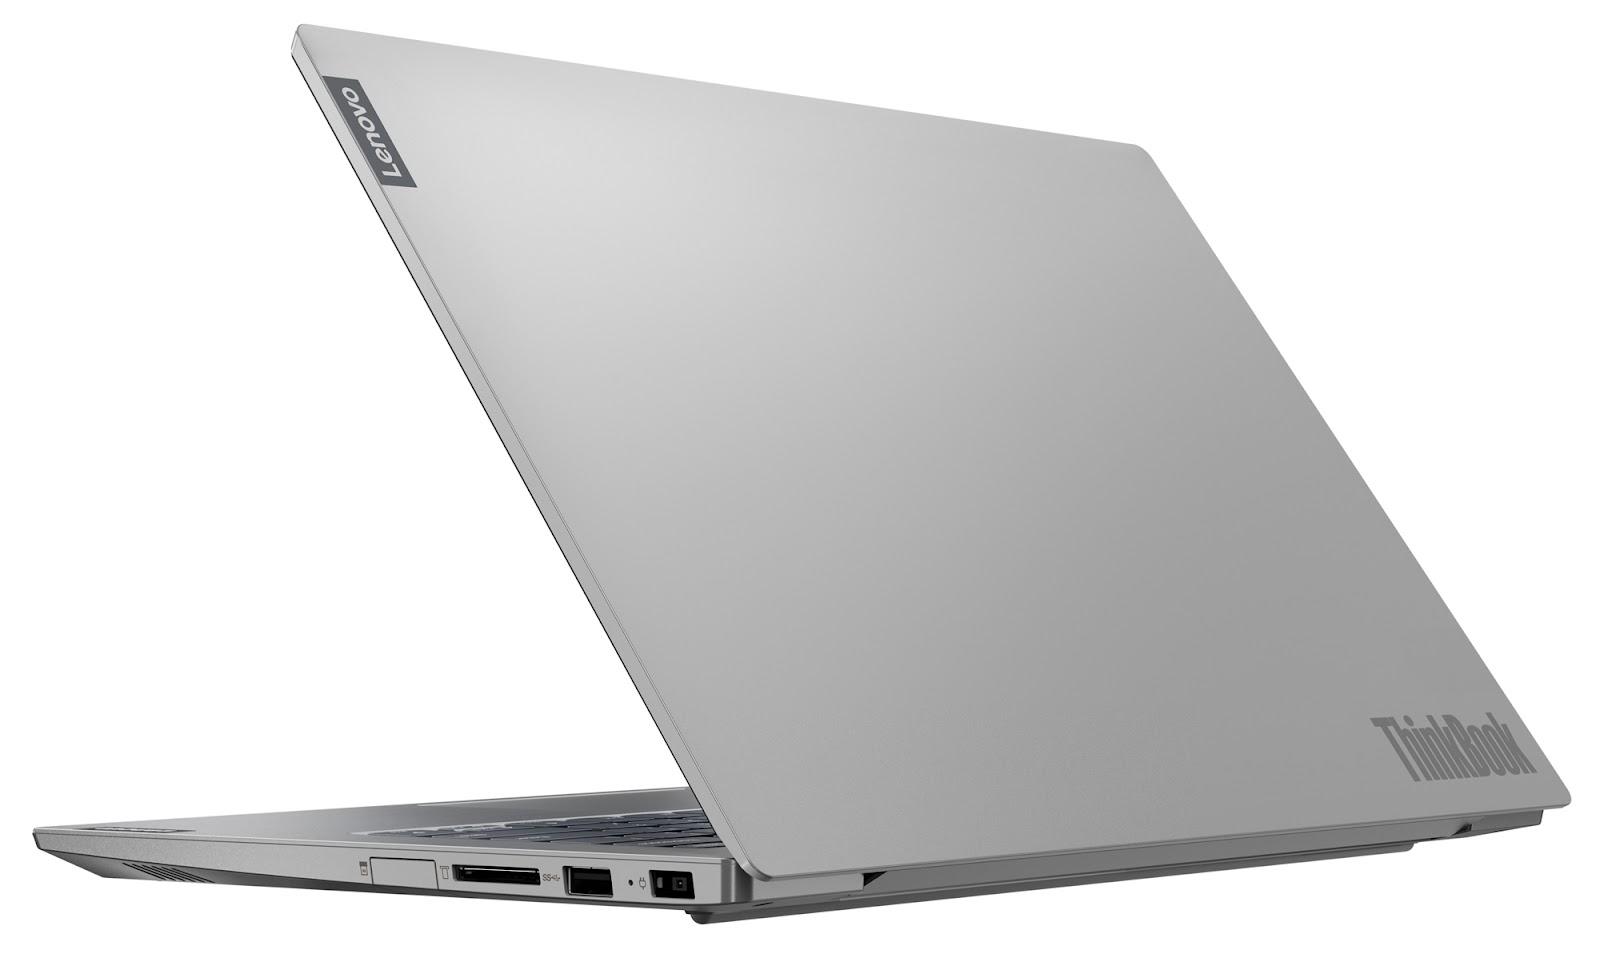 Фото 2. Ноутбук Lenovo ThinkBook 14 IIL (20SL000LRU)